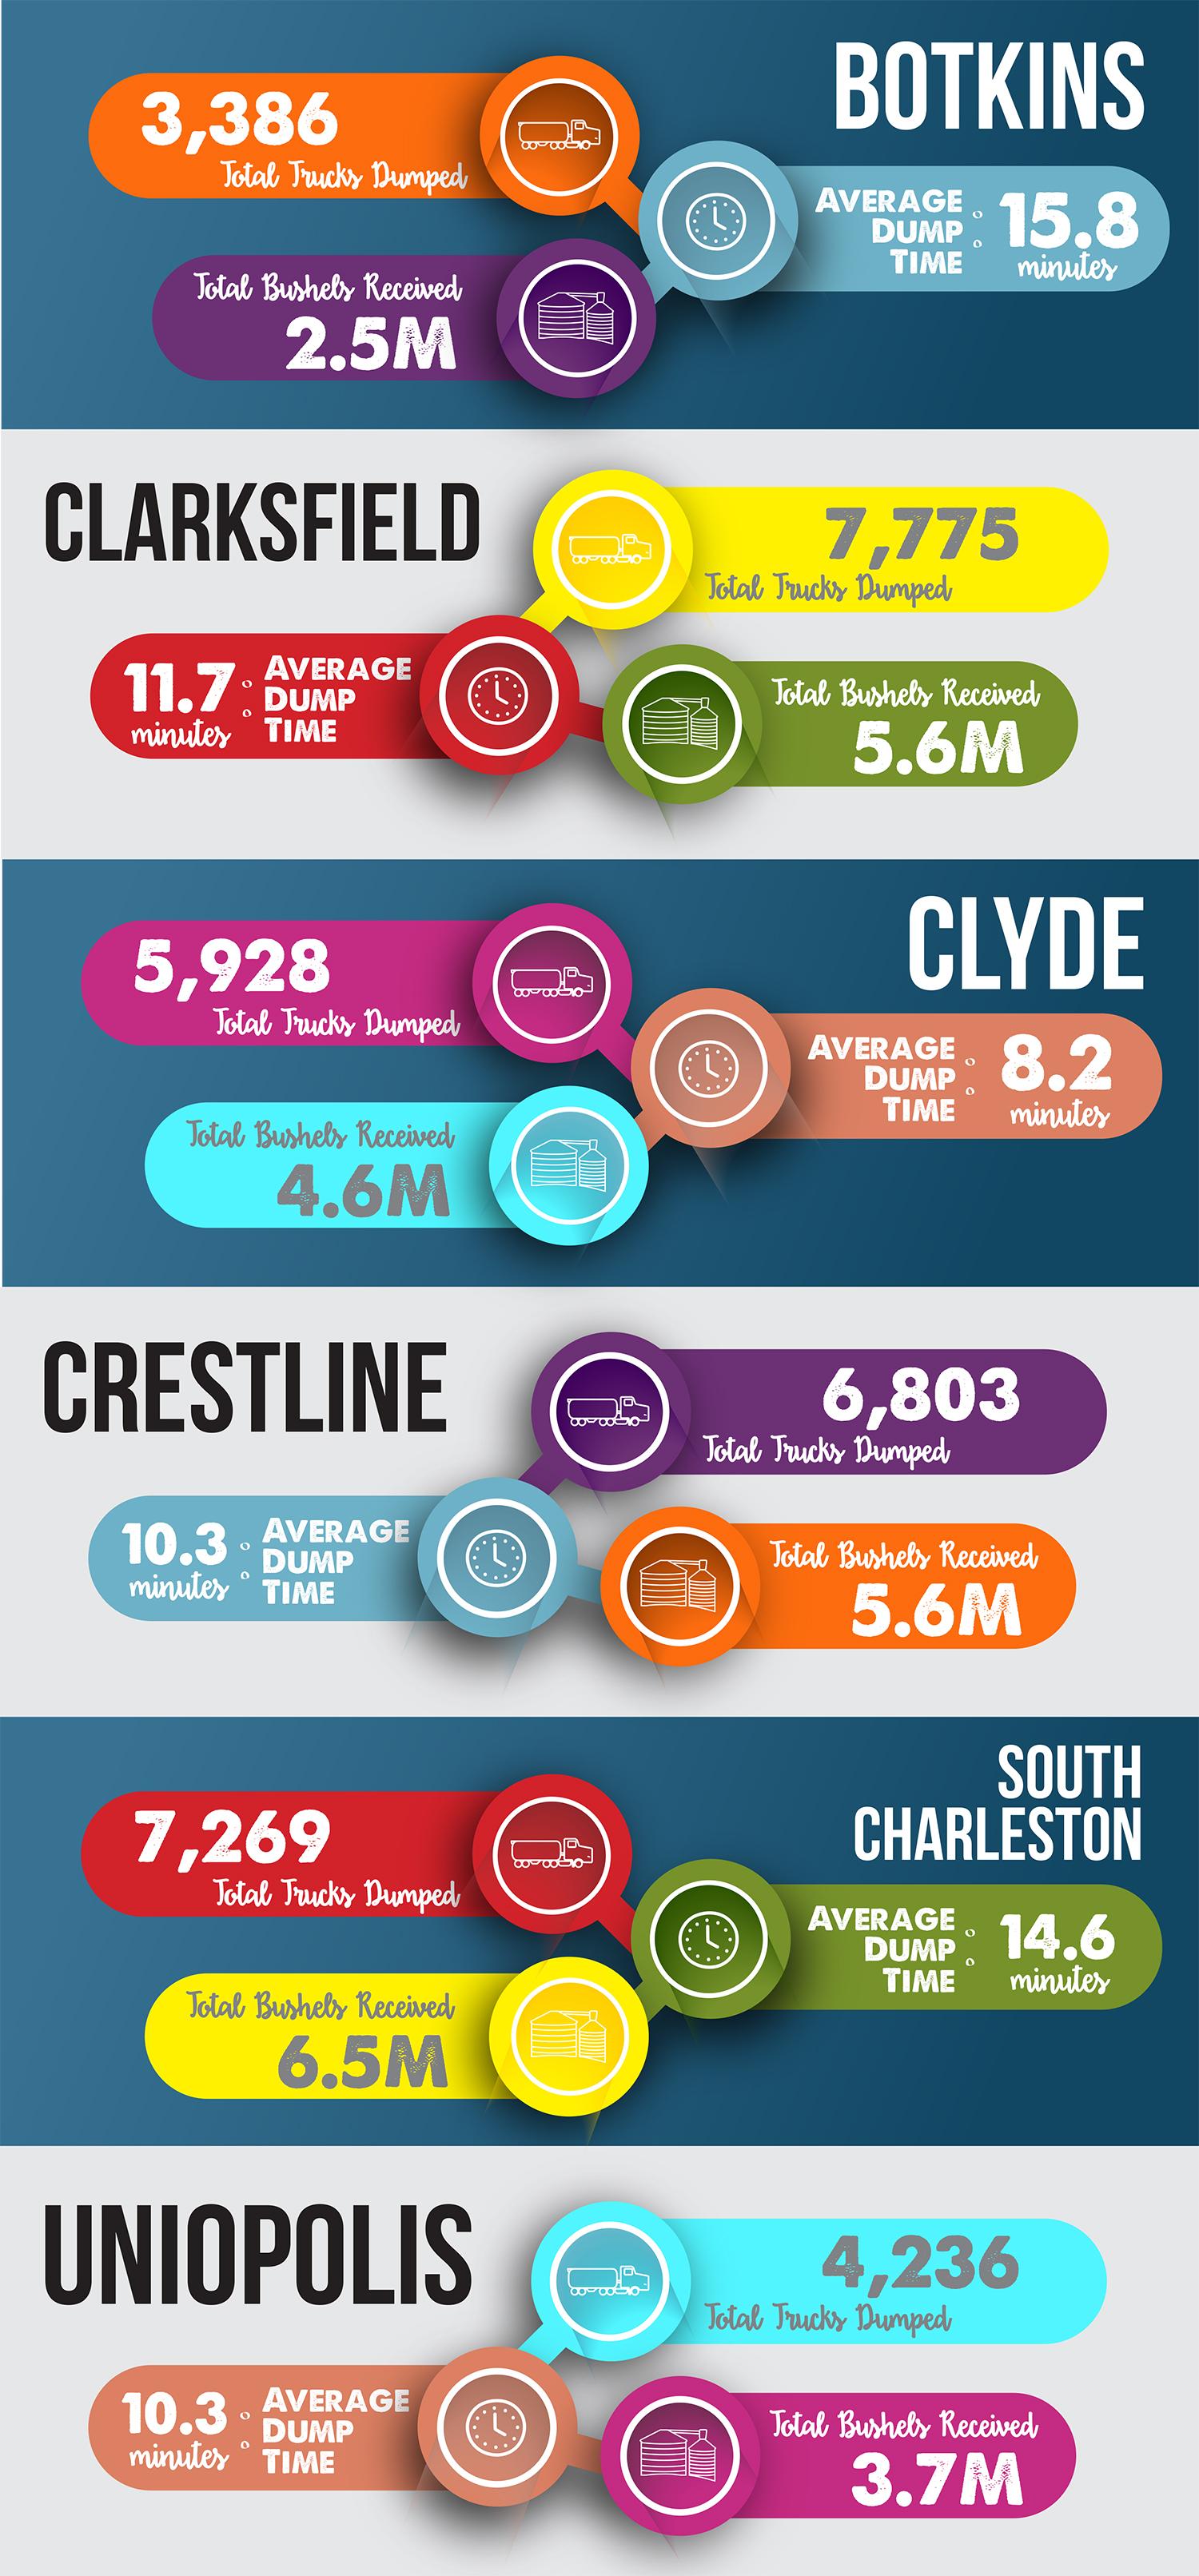 DumpTotal-NEW-Infographic.jpg